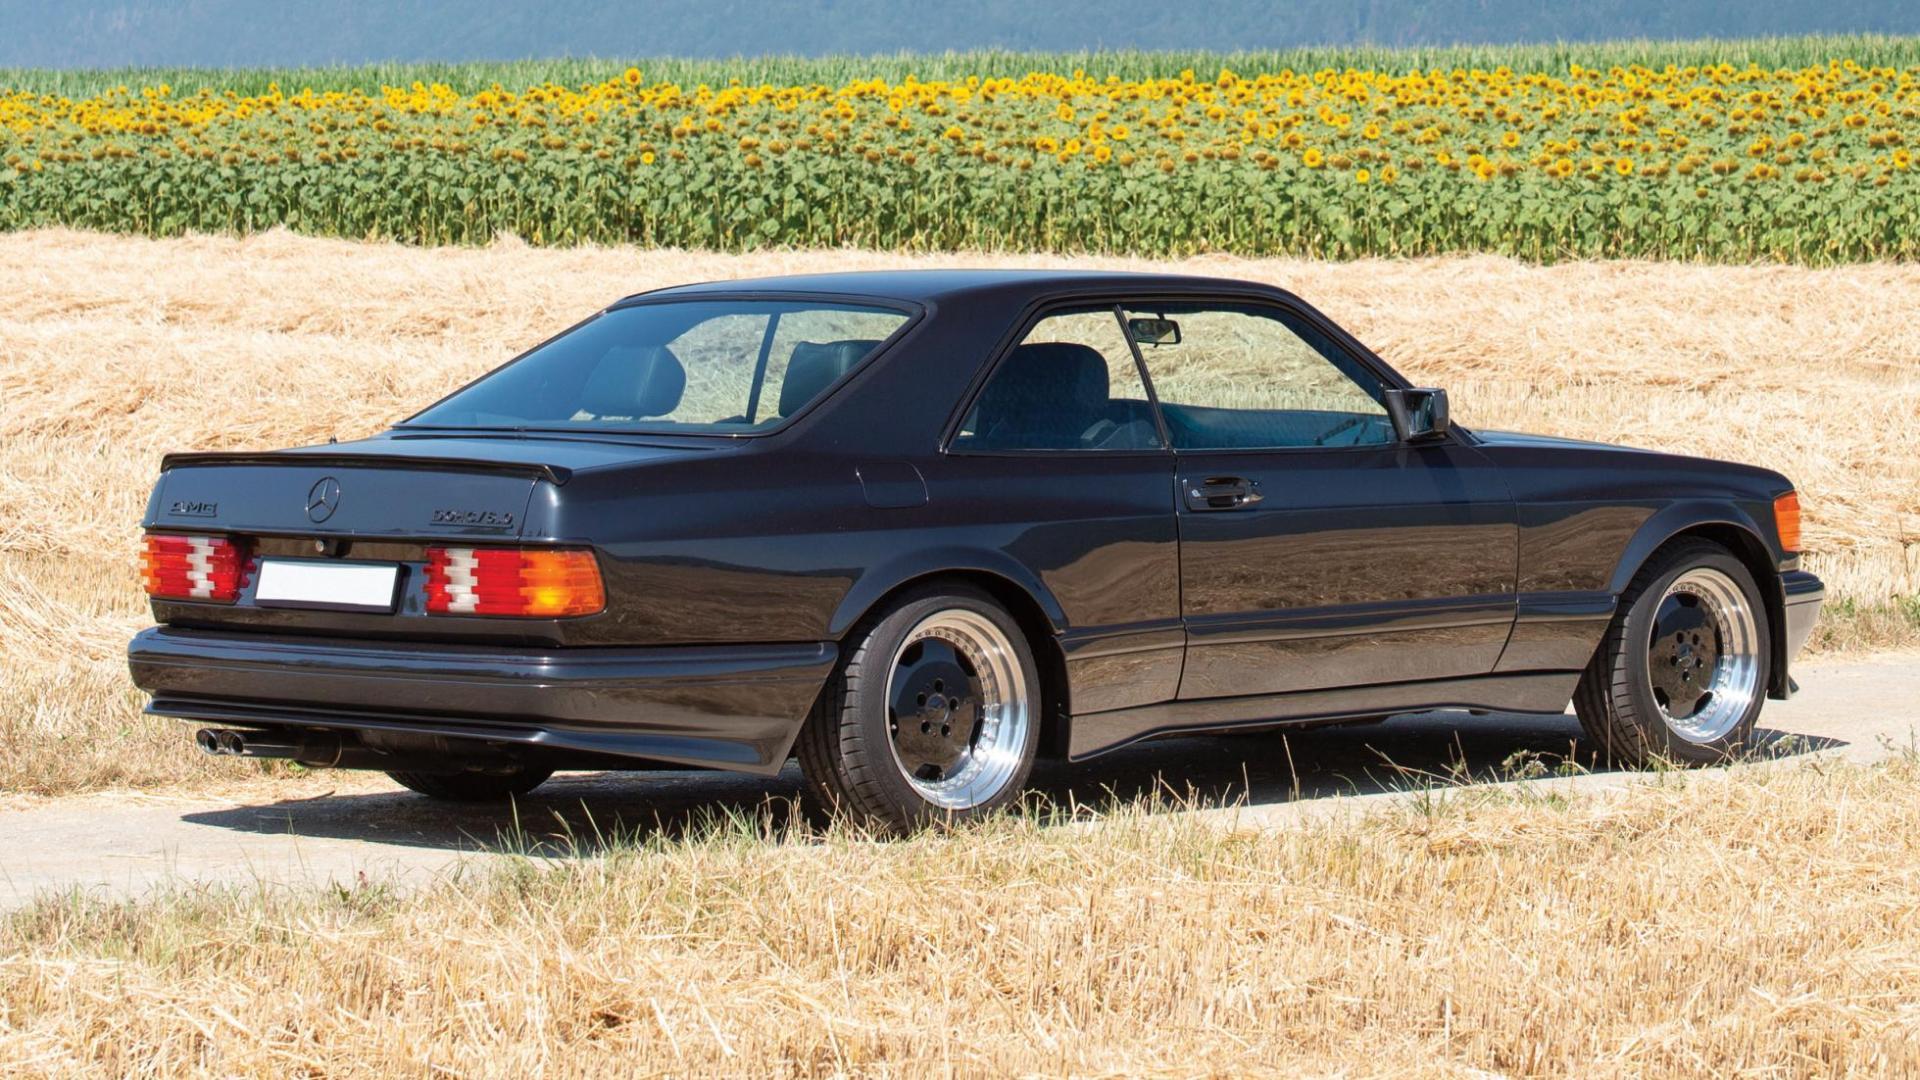 1991-mercedes-benz-560-sec-amg-6-0-wide-body-_16